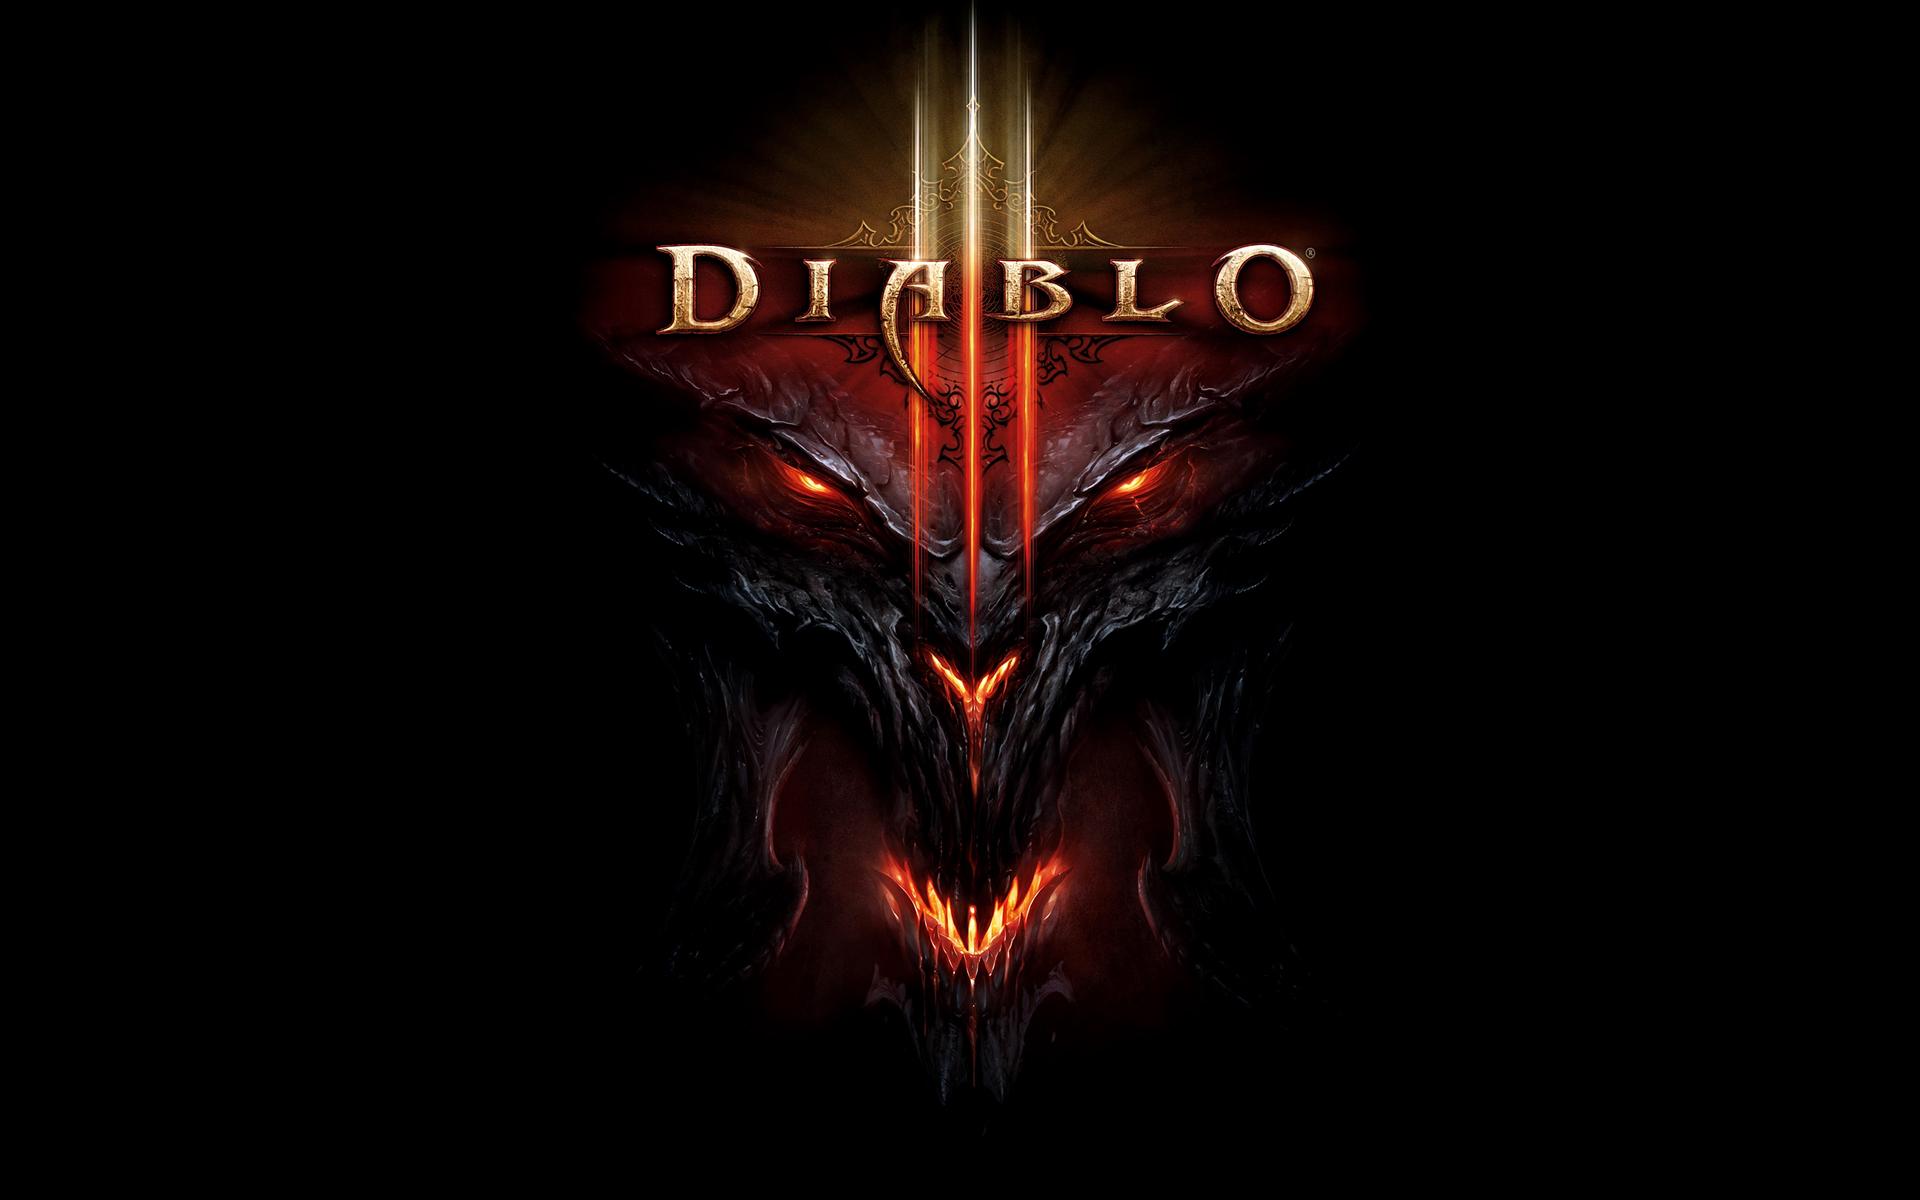 Hottest 1080p Diablo 3 Wallpaper 1920x1080 17300 Hd Wallpapers 1920x1200